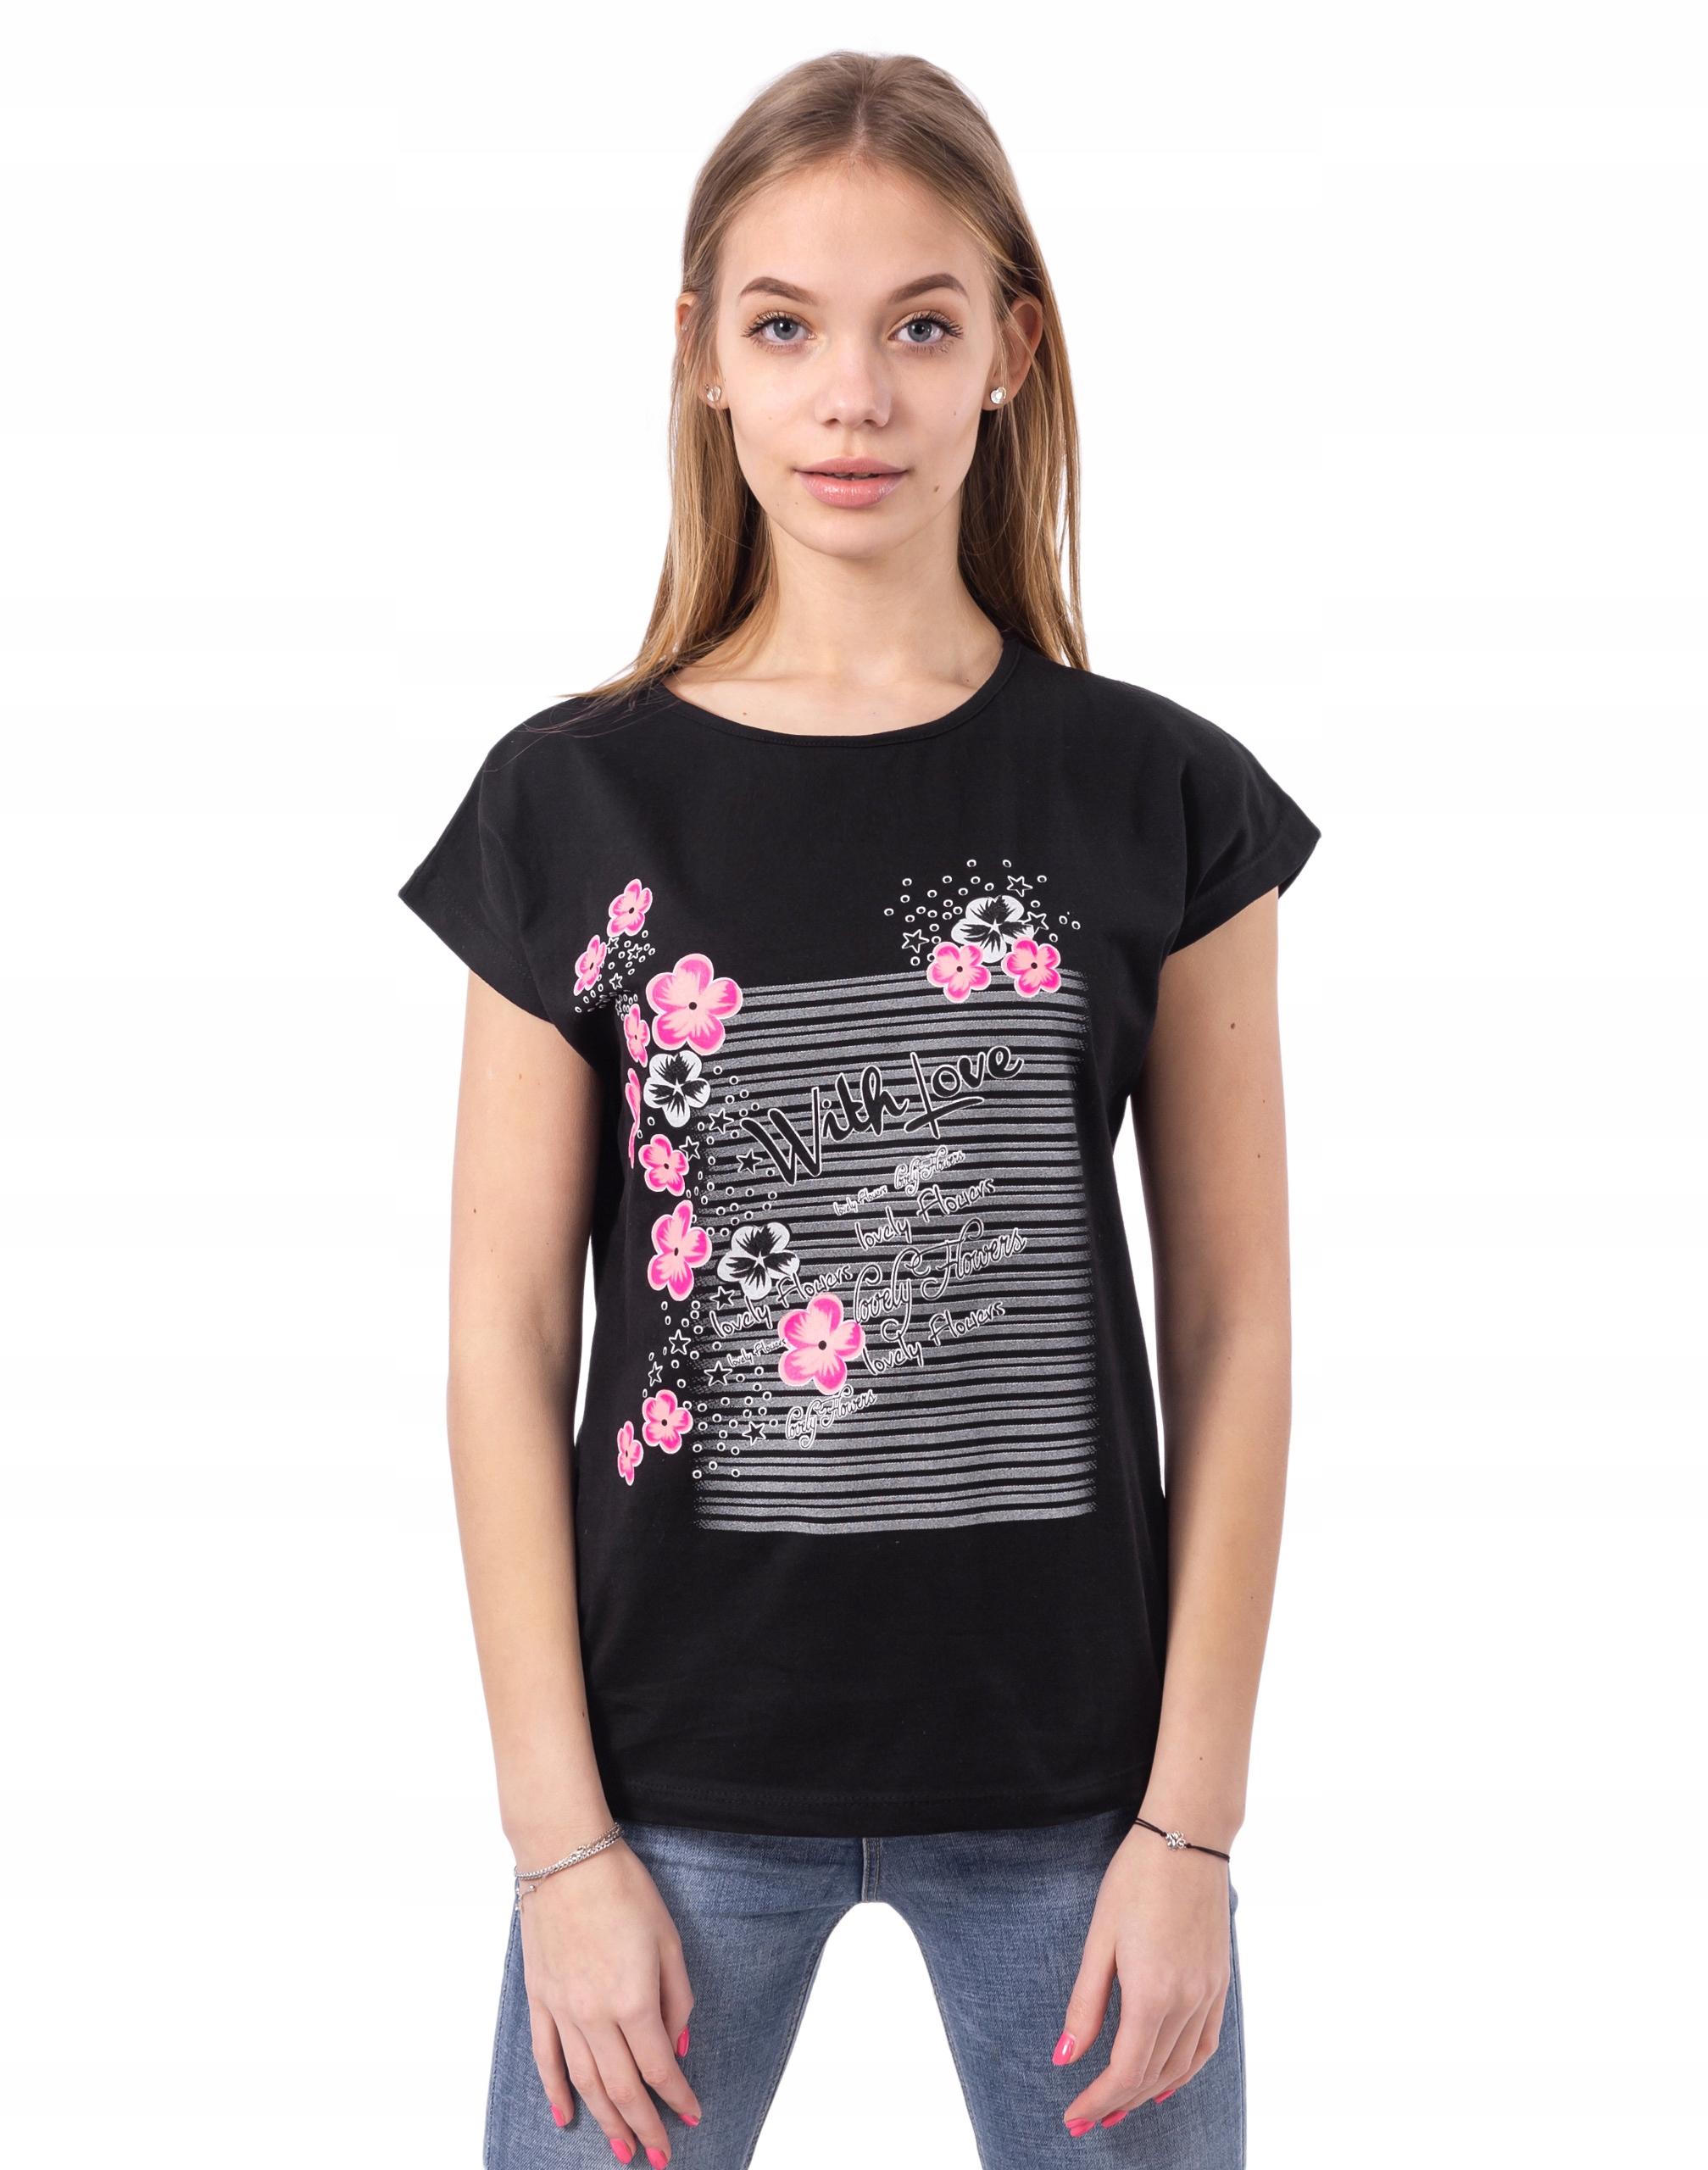 Koszulka Bluzka Damska Podkoszulek Top DK06-03 r L